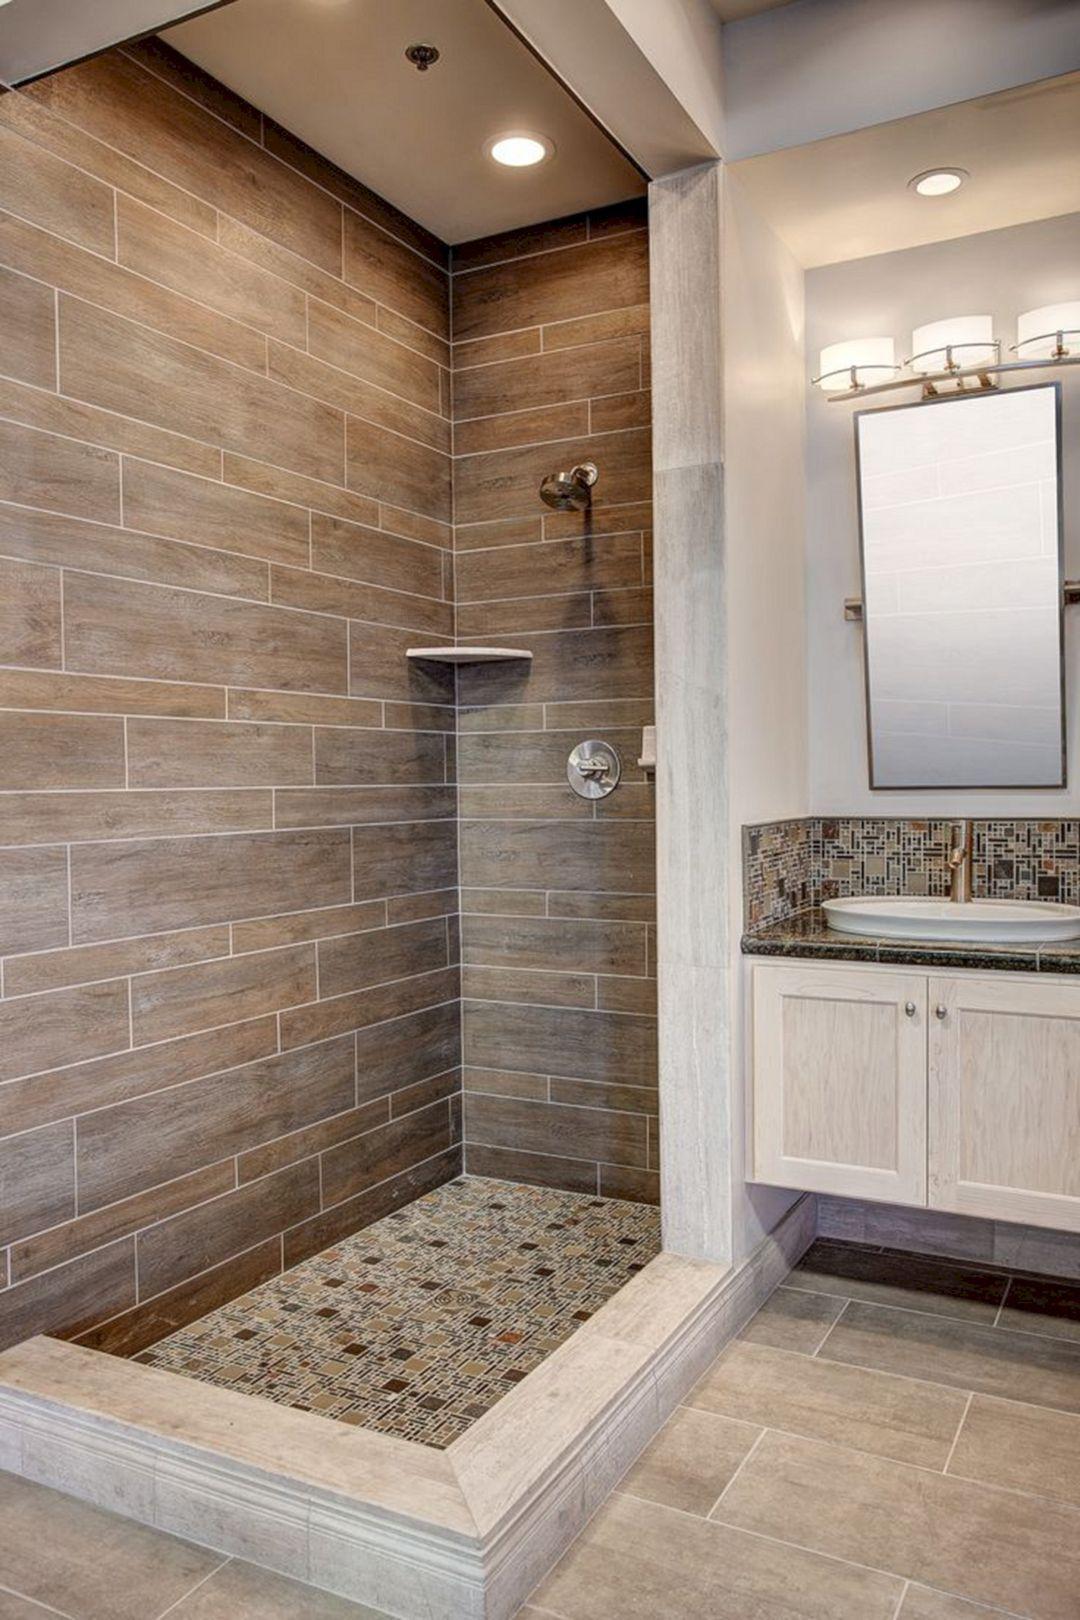 21 Bathroom Remodel Ideas The Latest Modern Design Wood Tile Bathroom Patterned Bathroom Tiles Tiny House Bathroom